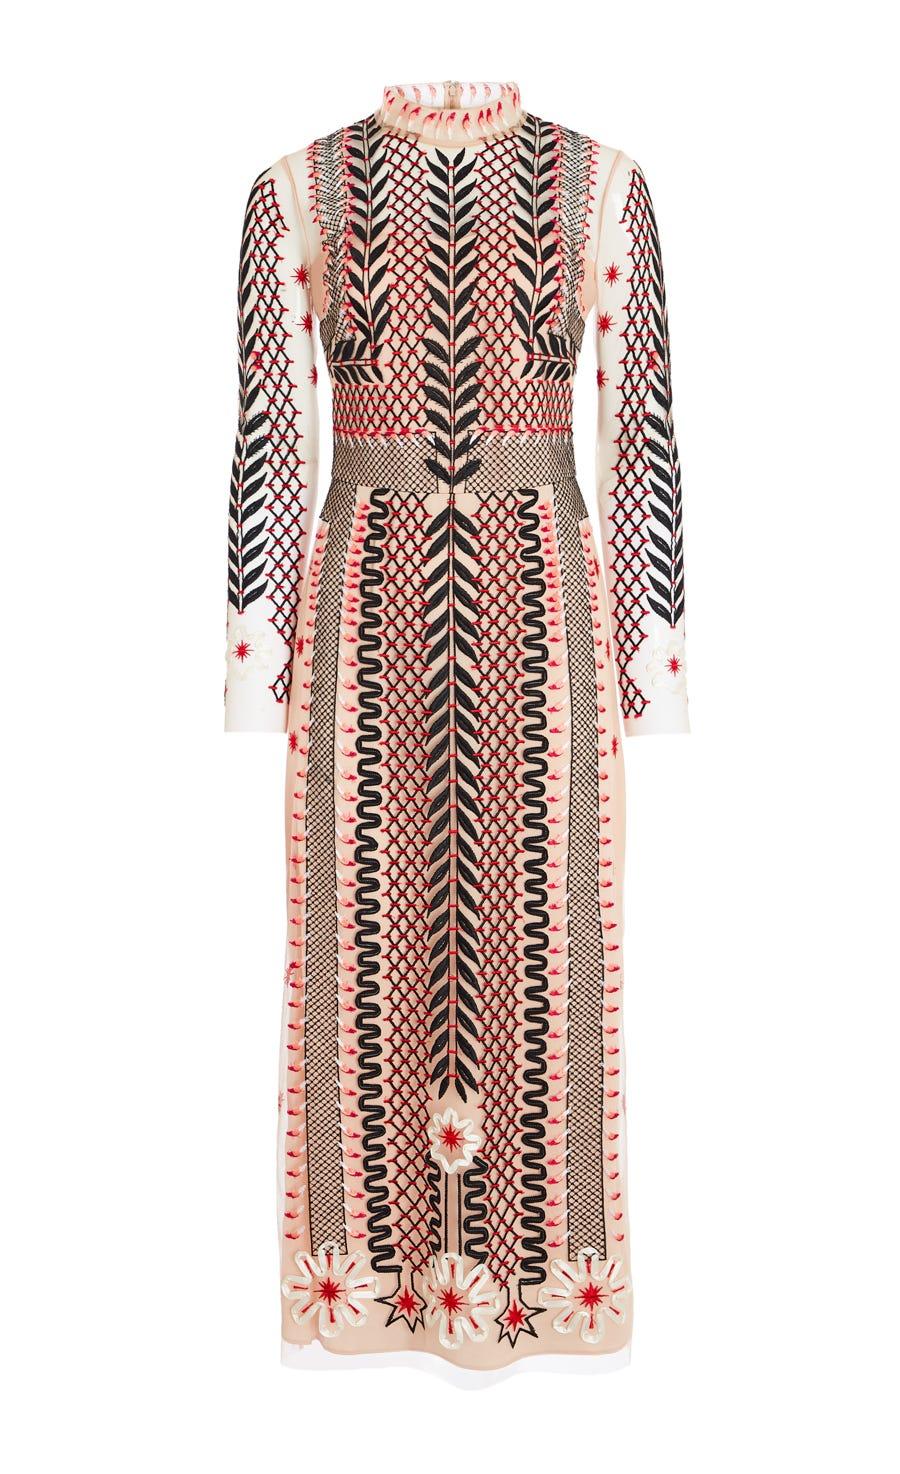 Teahouse Sleeved Dress